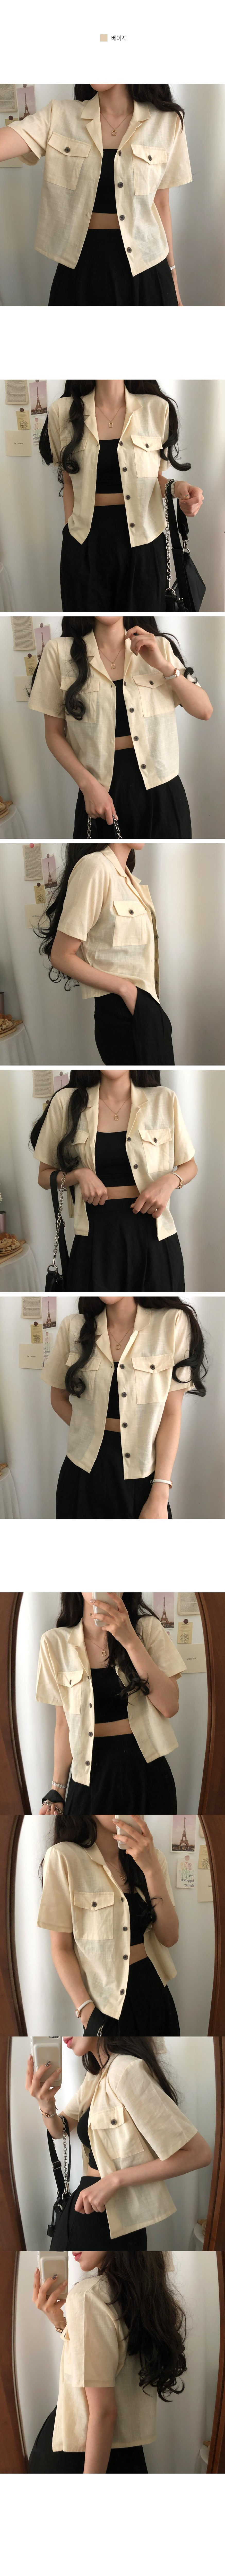 Packer Pocket Linen Short Sleeve Jacket